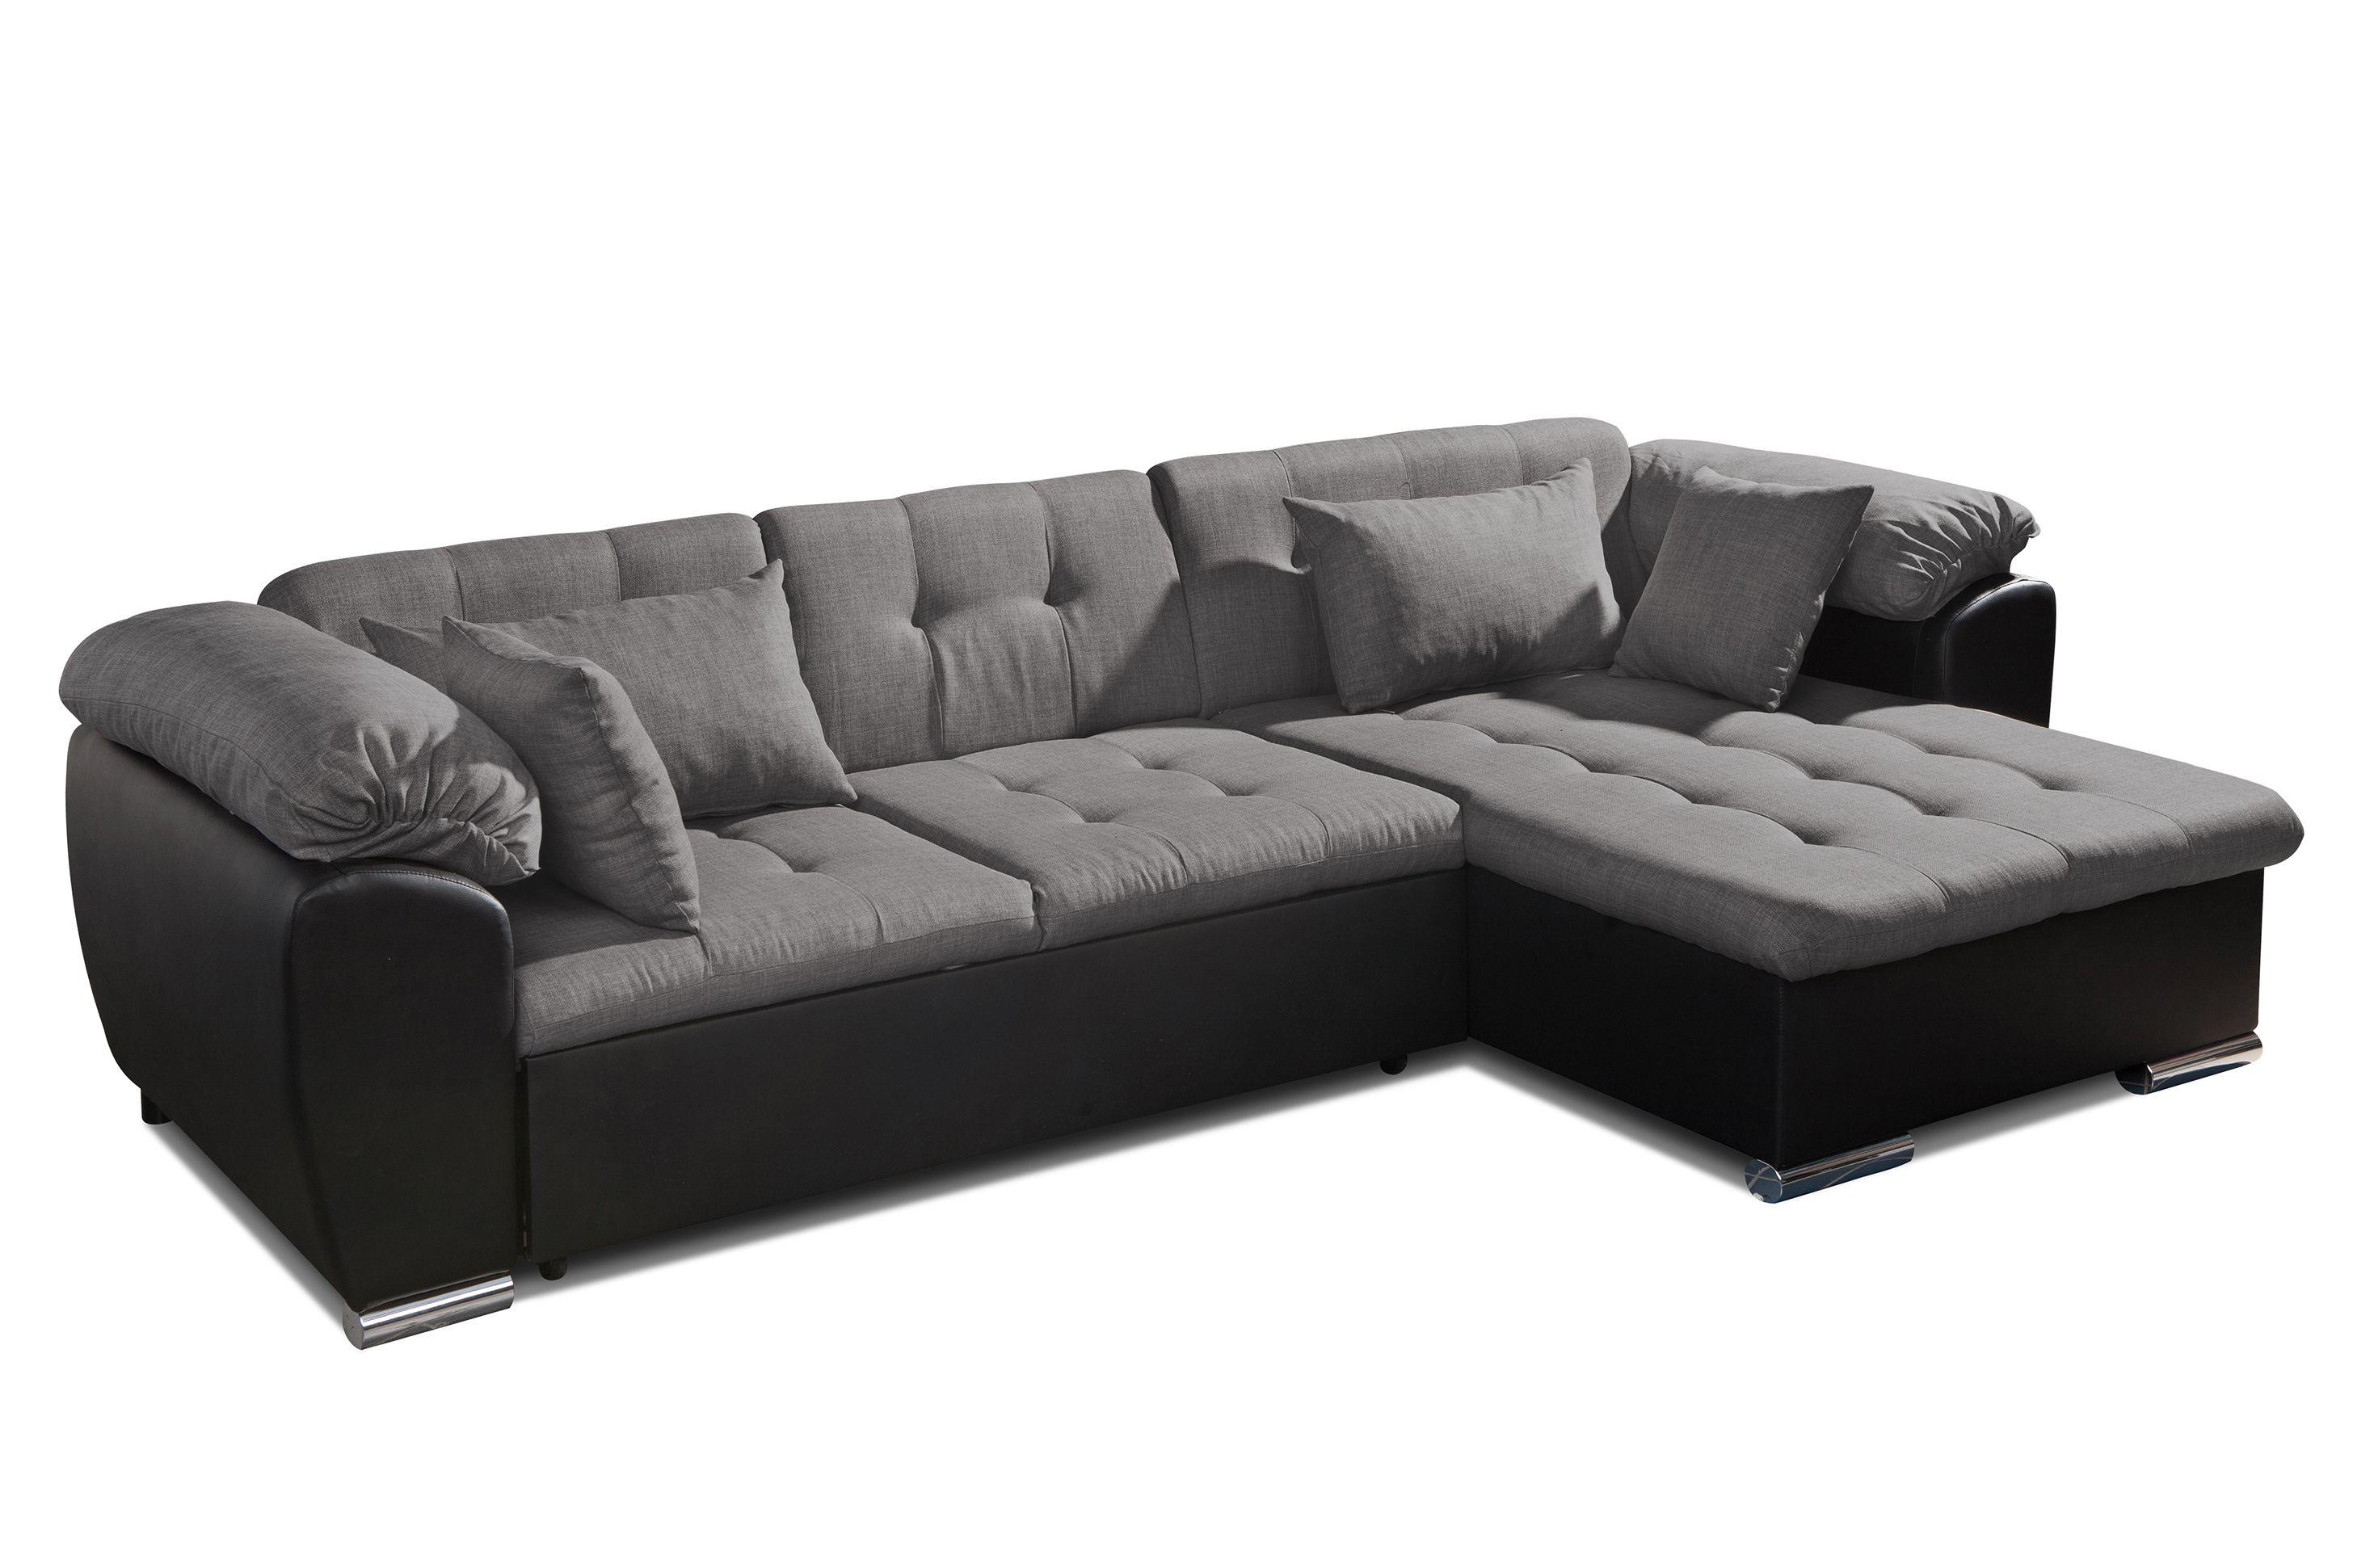 Leather Corner Sofa Beds Uk Surferoaxaca Com Leather Corner Sofa 2 Seater Corner Sofa Corner Sofa Bed